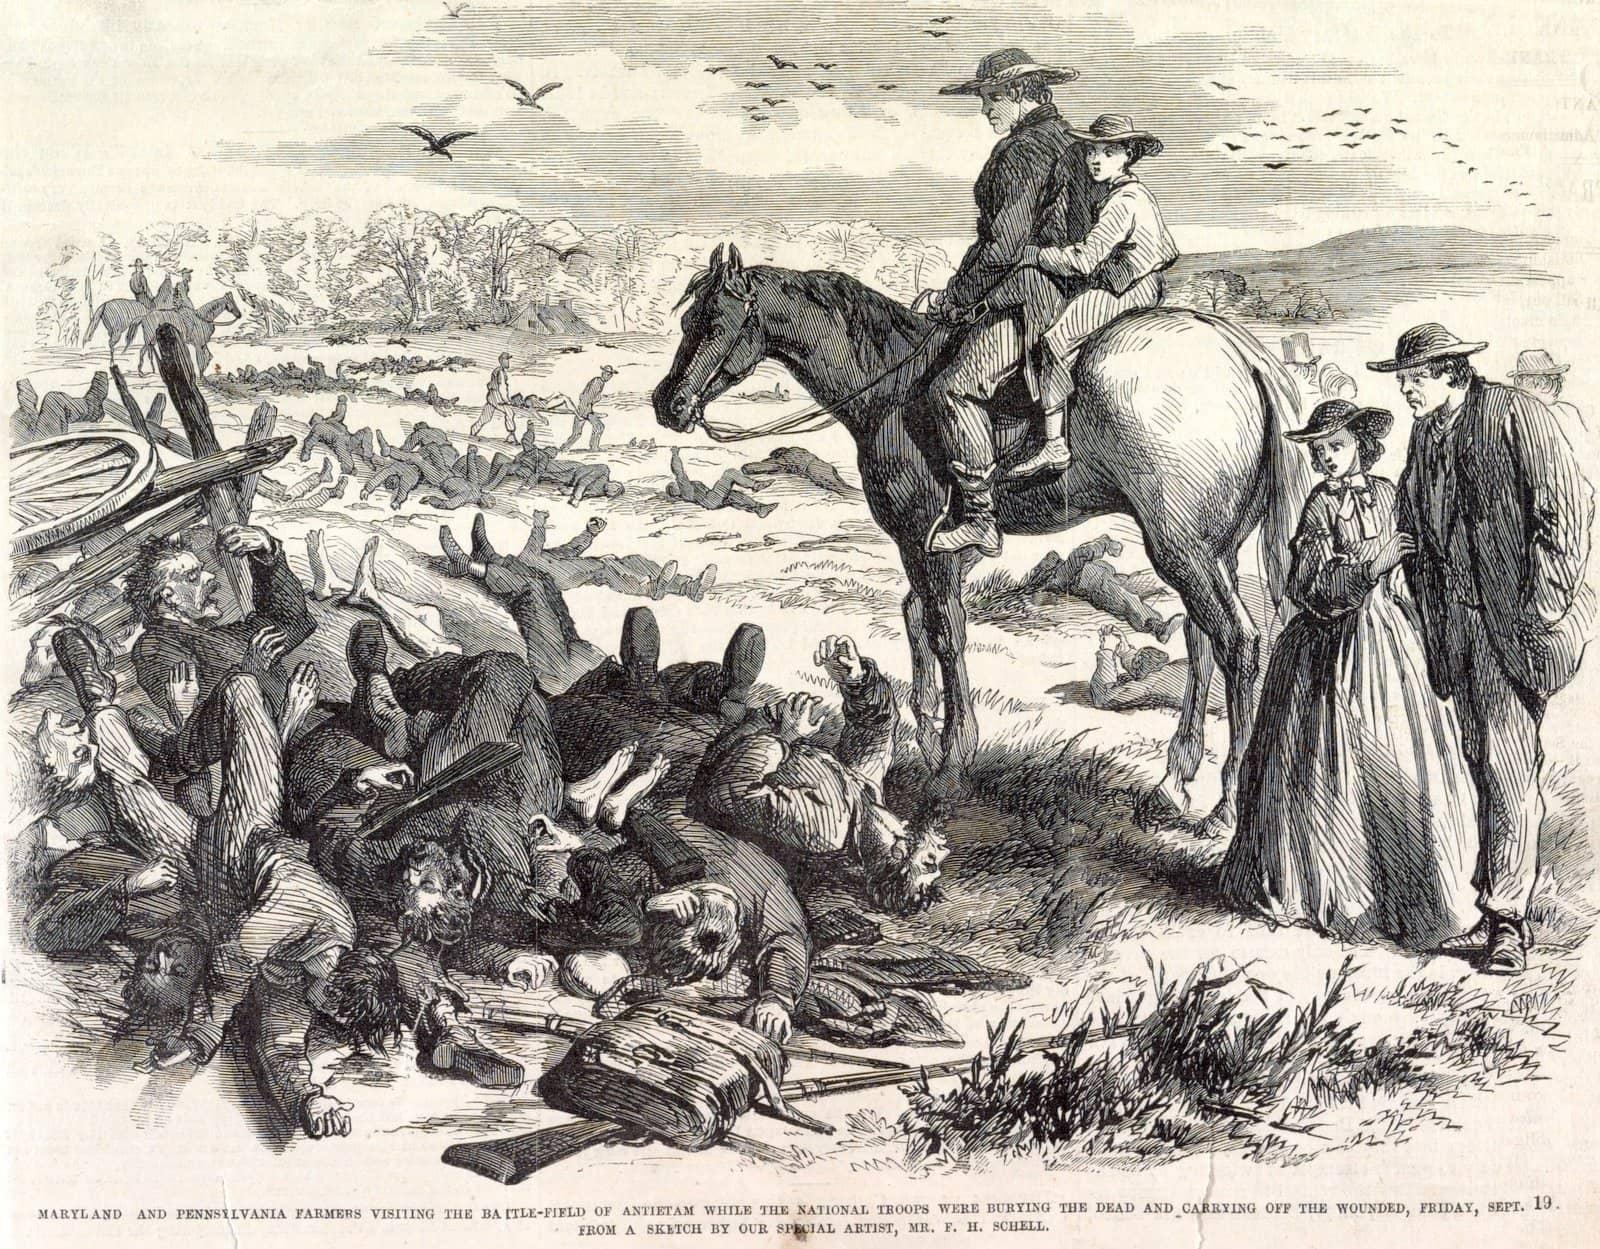 Maryland and Pennsylvania farmers visiting the battlefield of Antietam - Civil War (1962)